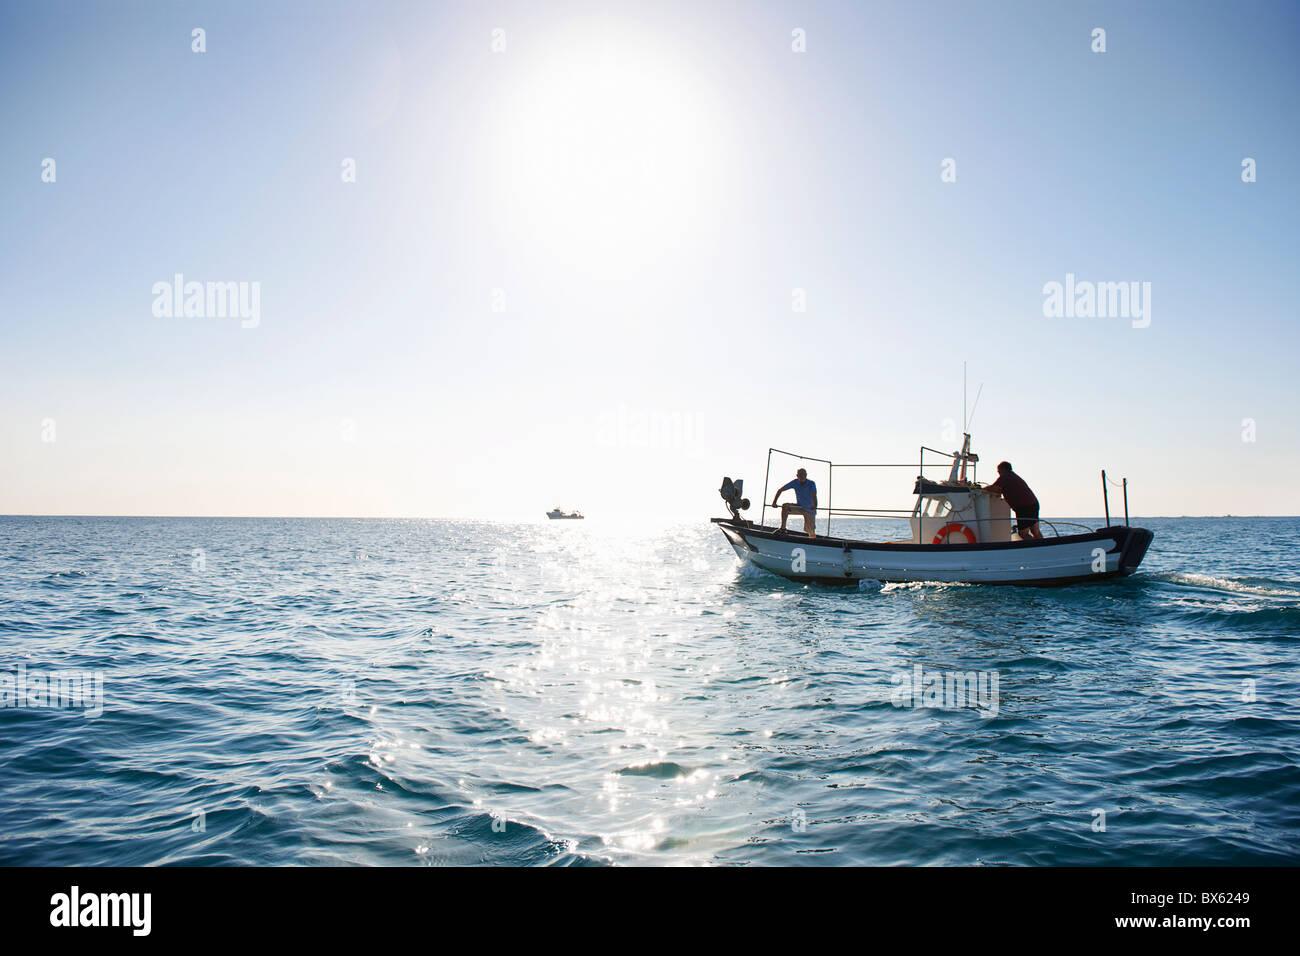 Bateau de pêche Les pêcheurs en mer Photo Stock